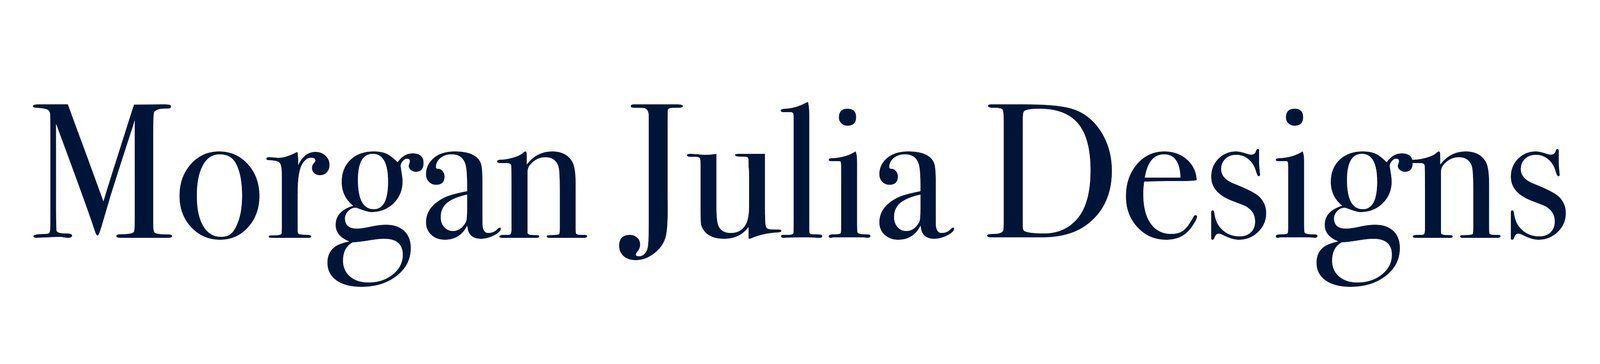 Morgan Julia Designs